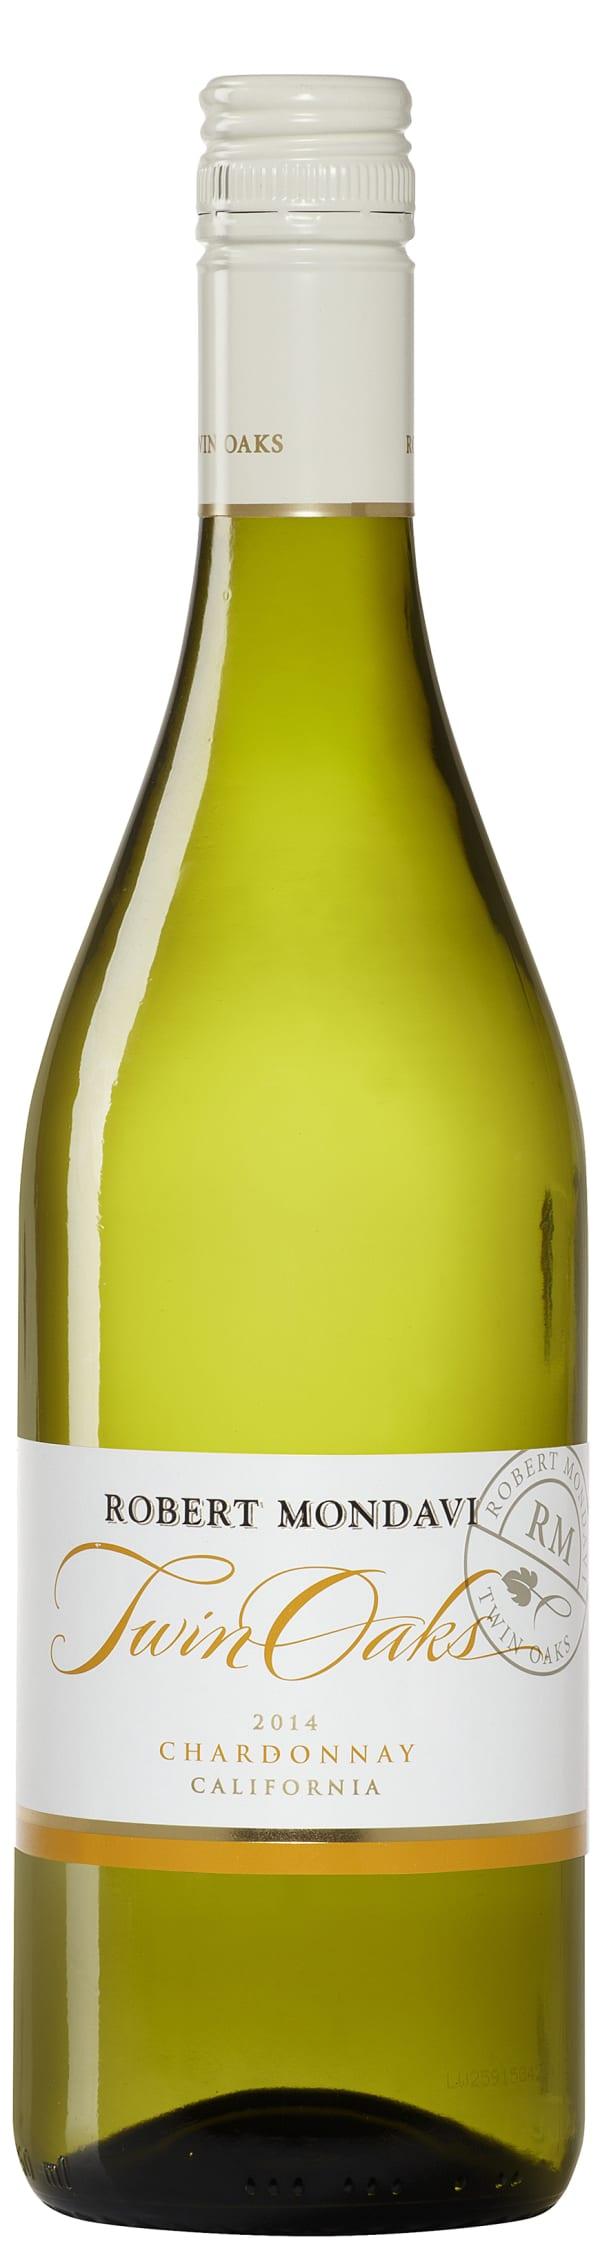 Robert Mondavi Twin Oaks Chardonnay 2014